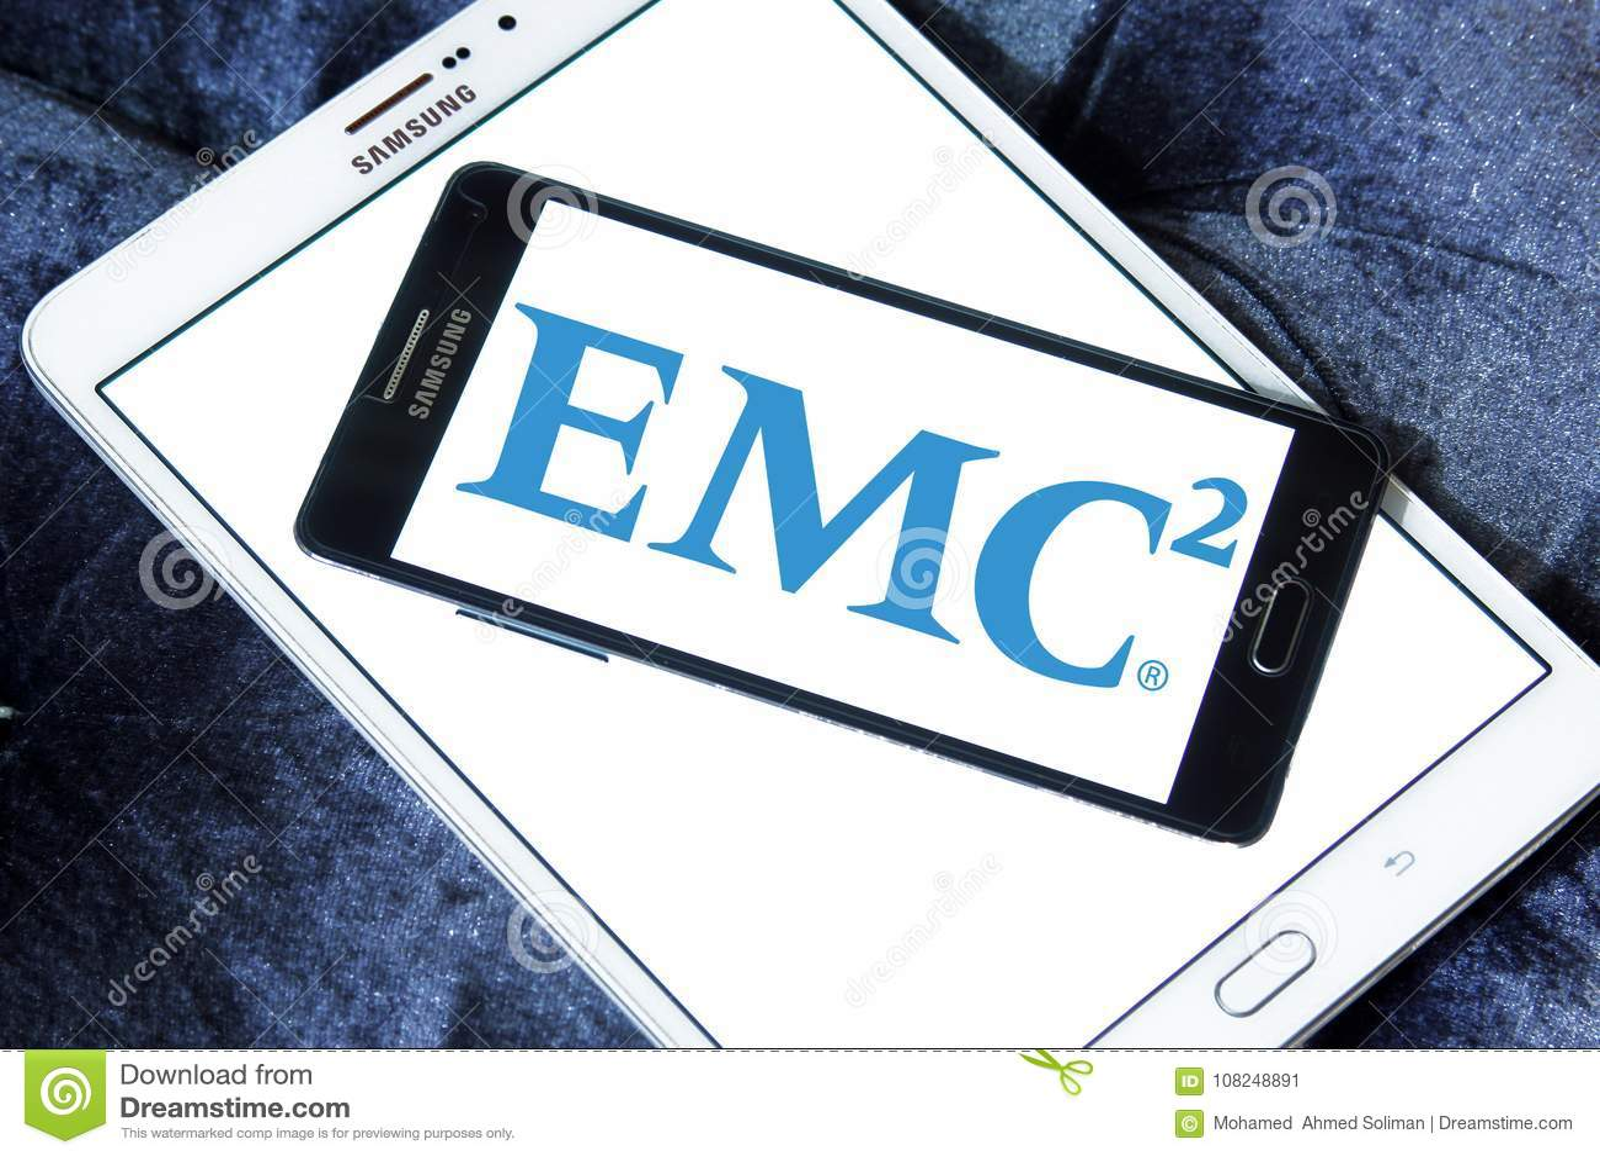 Emc2 Data Storage Company Logo Editorial Photo Illustration Of